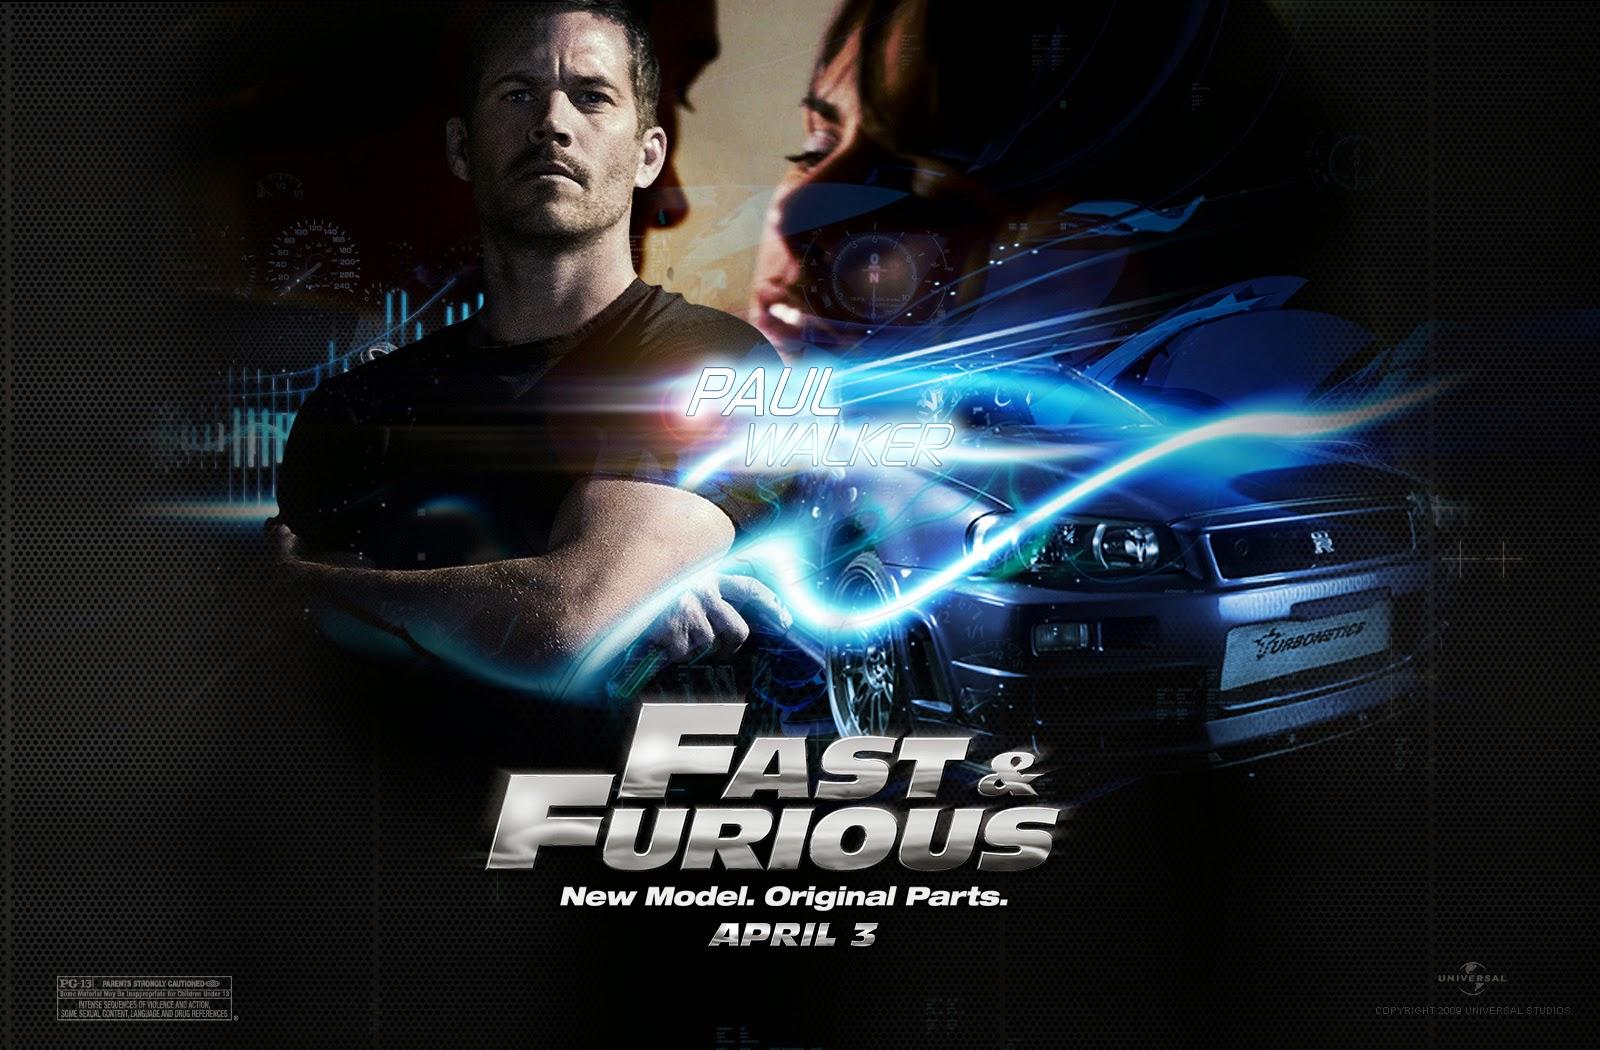 Paul Walker Fast And Furious Wallpaper Hd